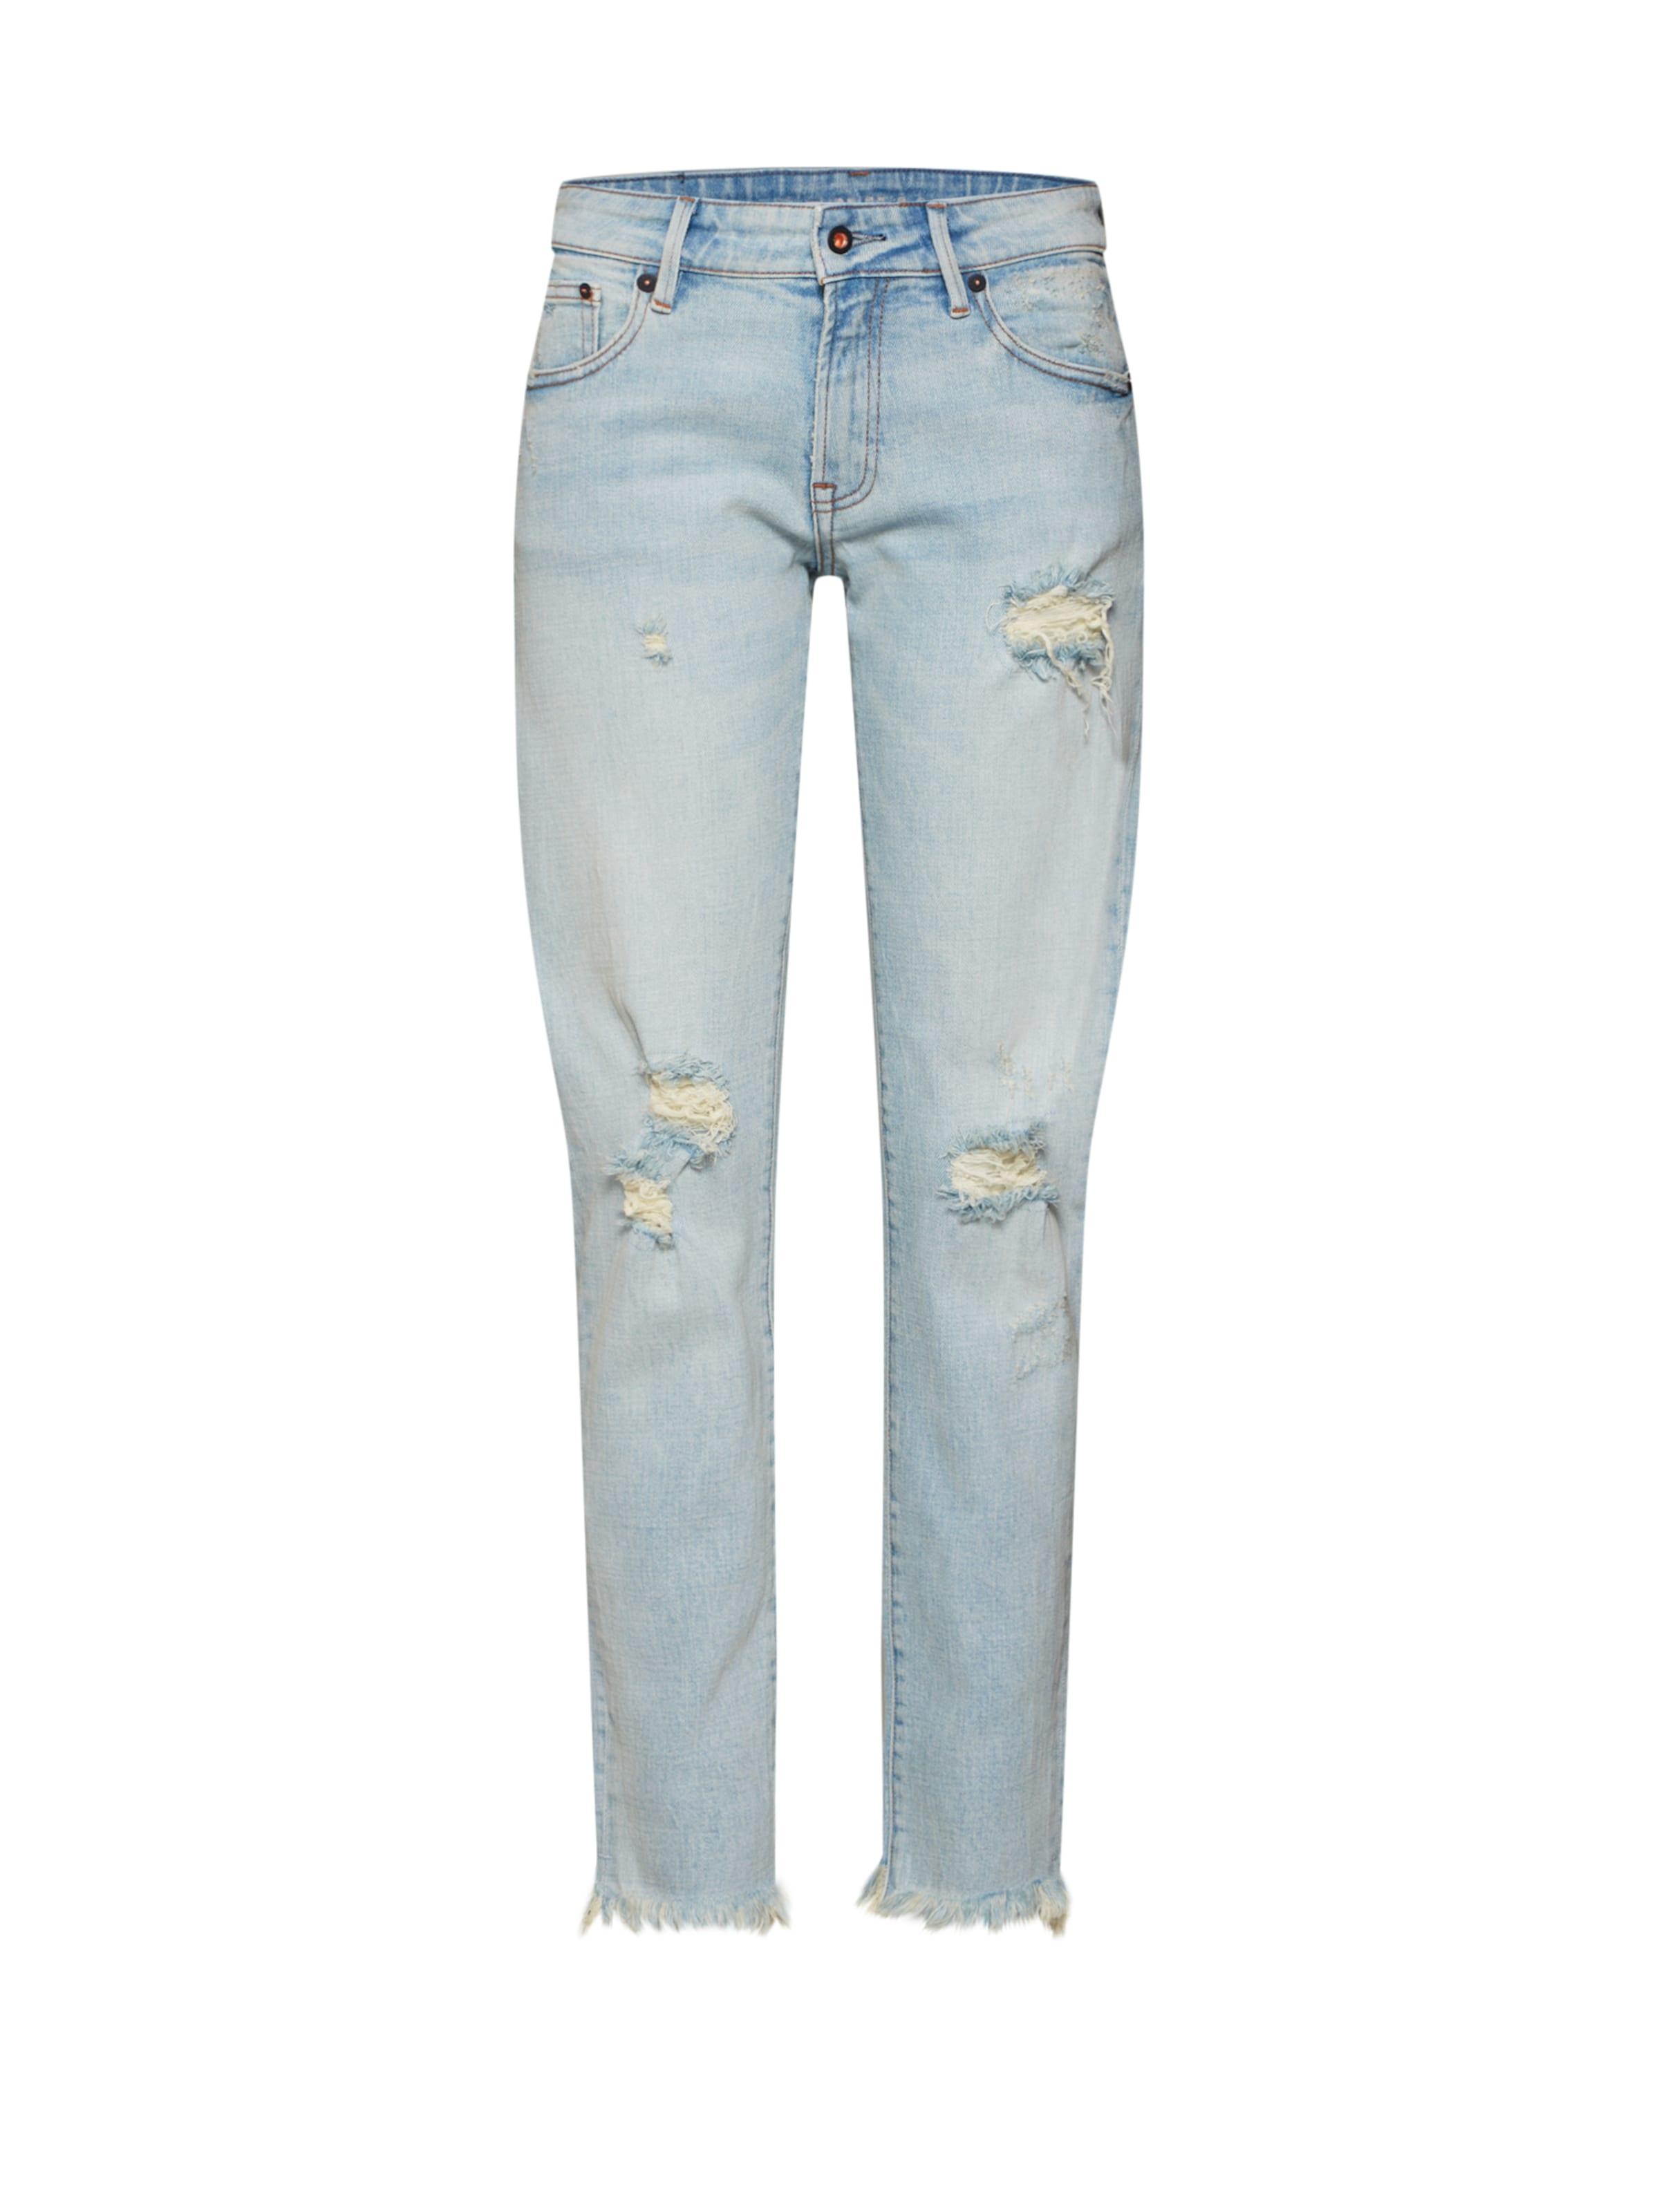 Denim 'monroe Rt' Denham Blue In Jeans Rq4c3L5Aj